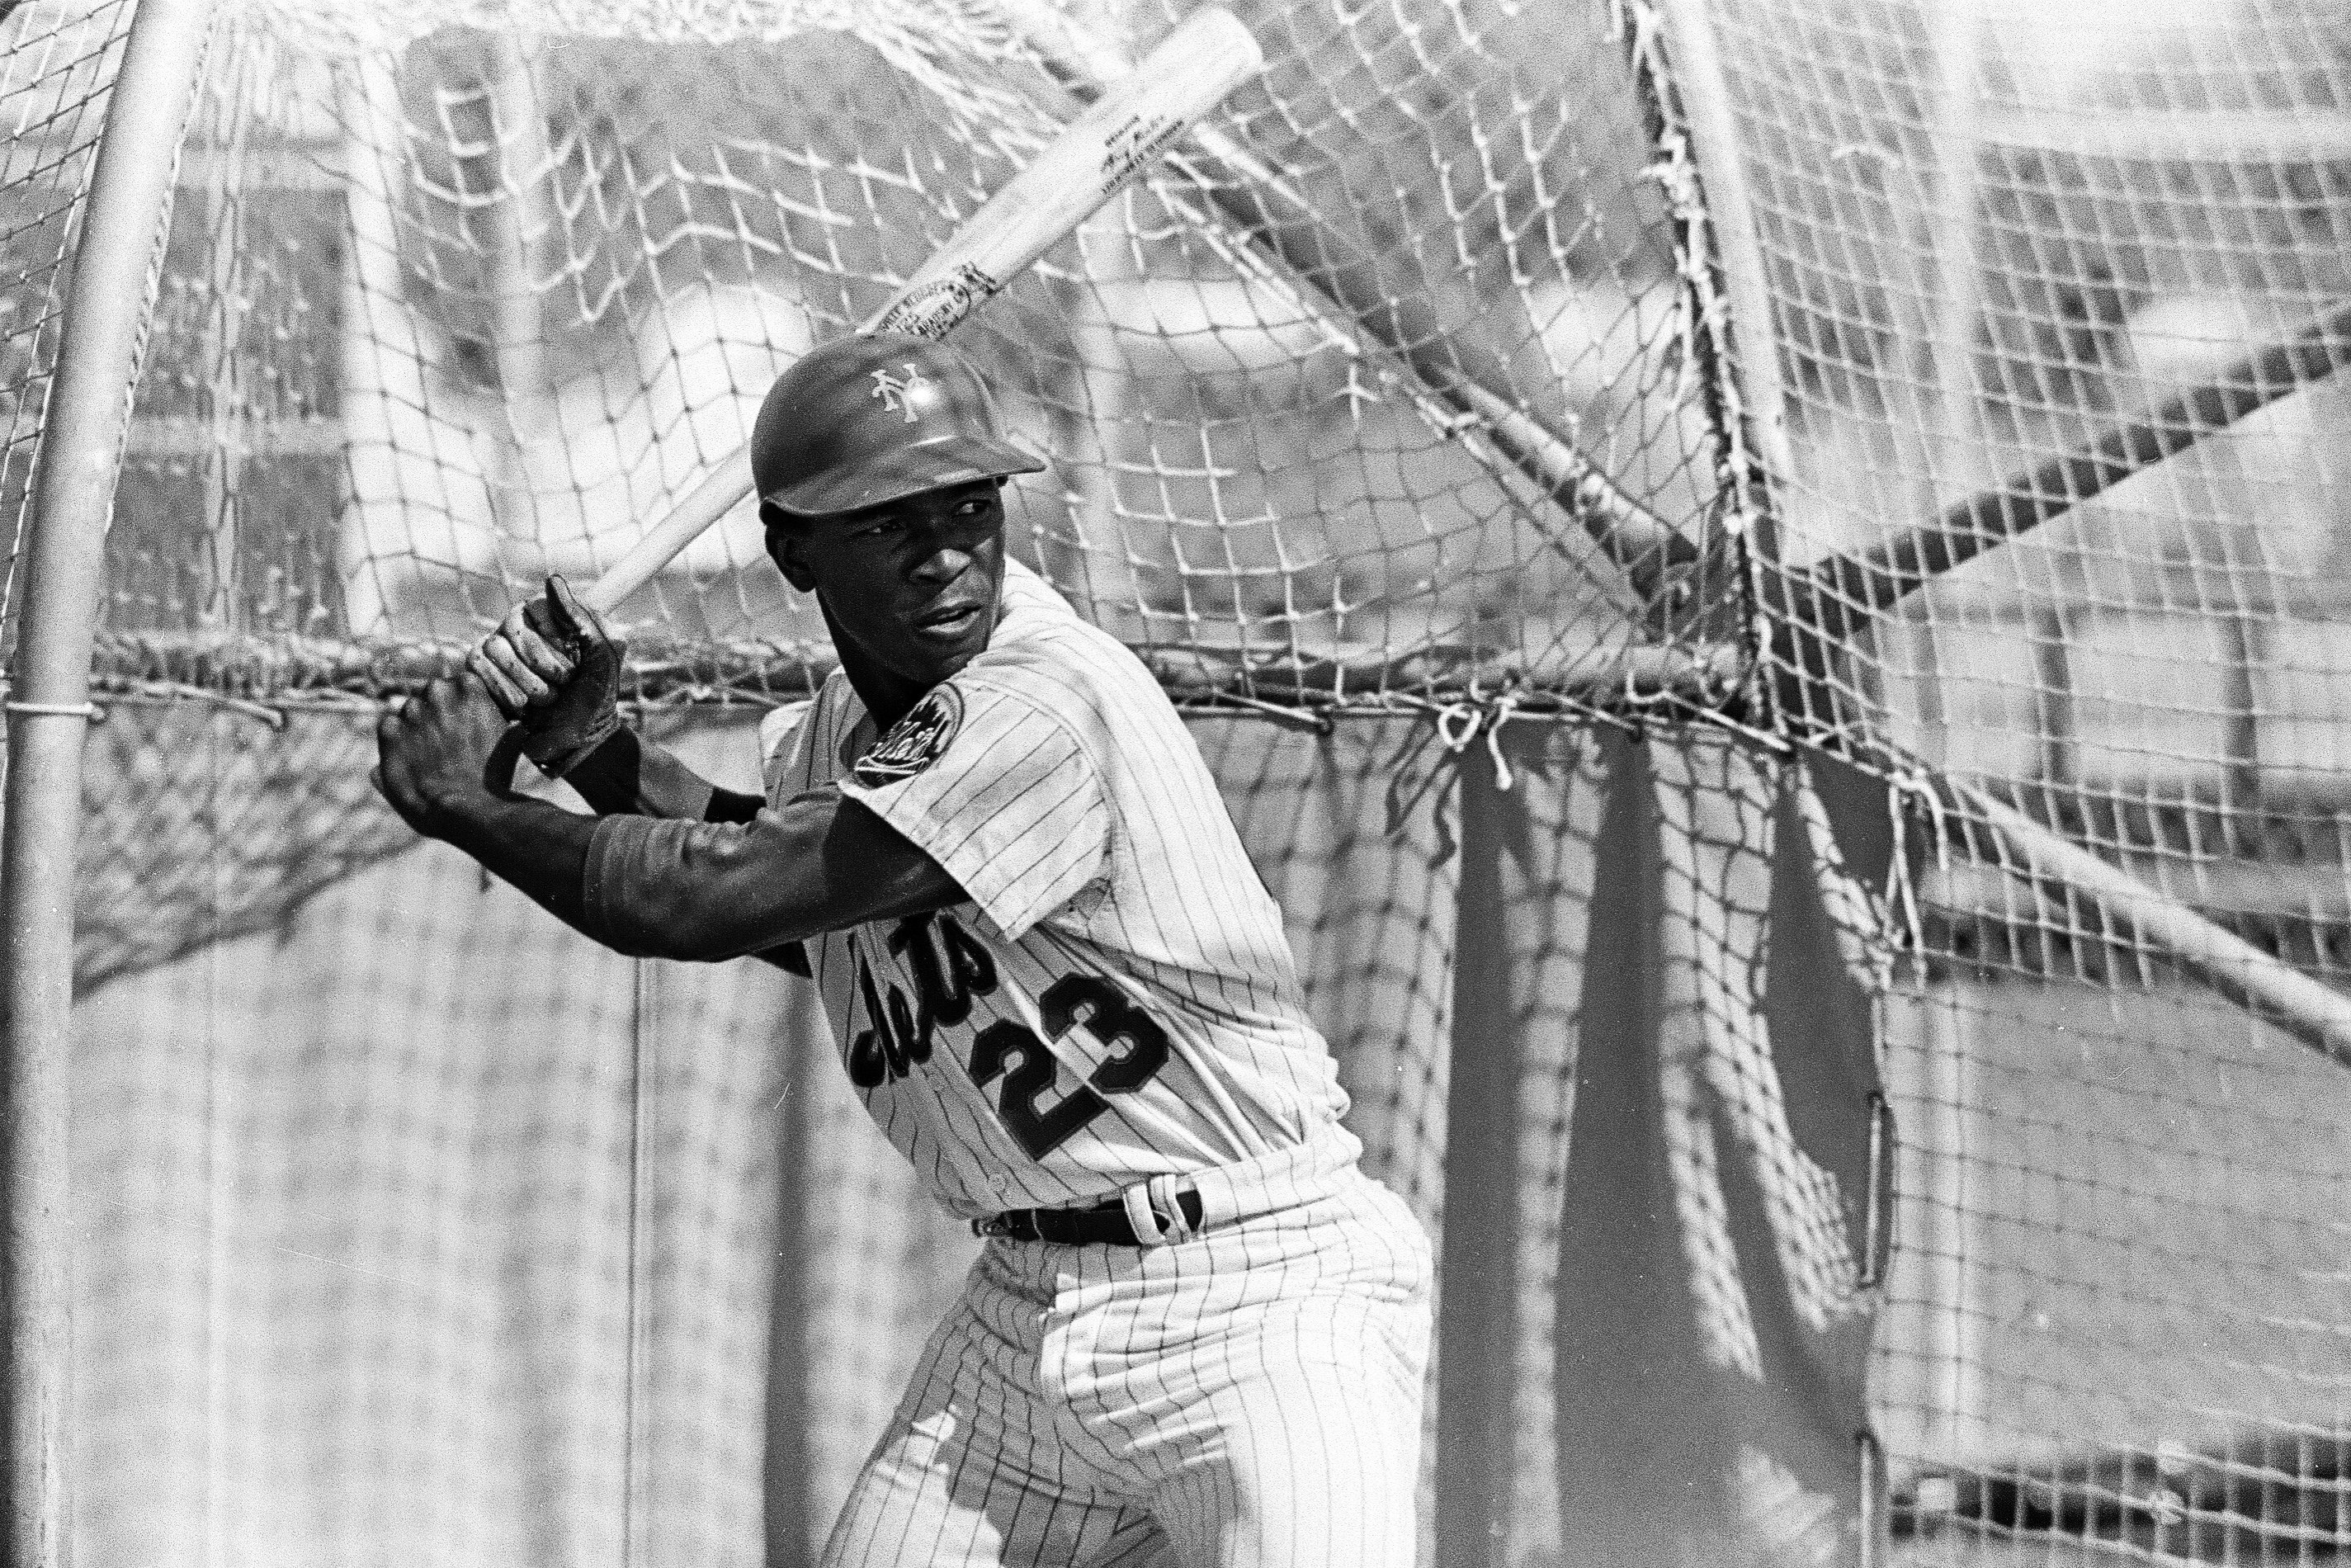 Leroy Stanton - New York Mets